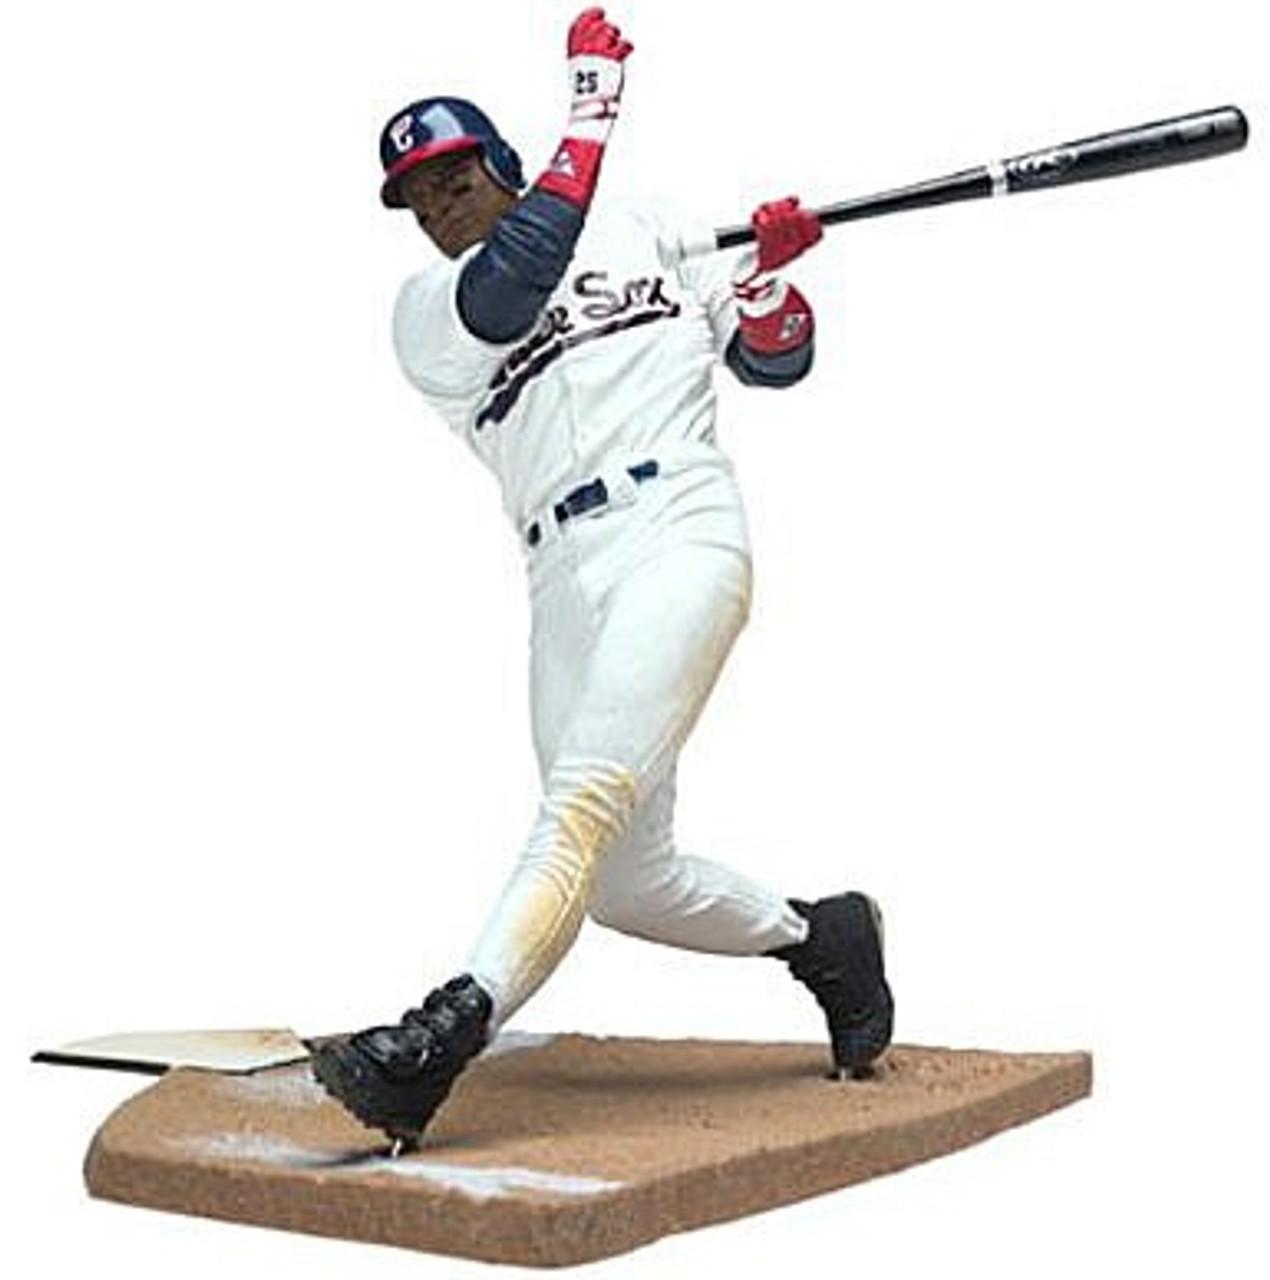 McFarlane Toys MLB Chicago White Sox Sports Picks Series 8 Sammy Sosa Action Figure [Retro White Sox Variant]